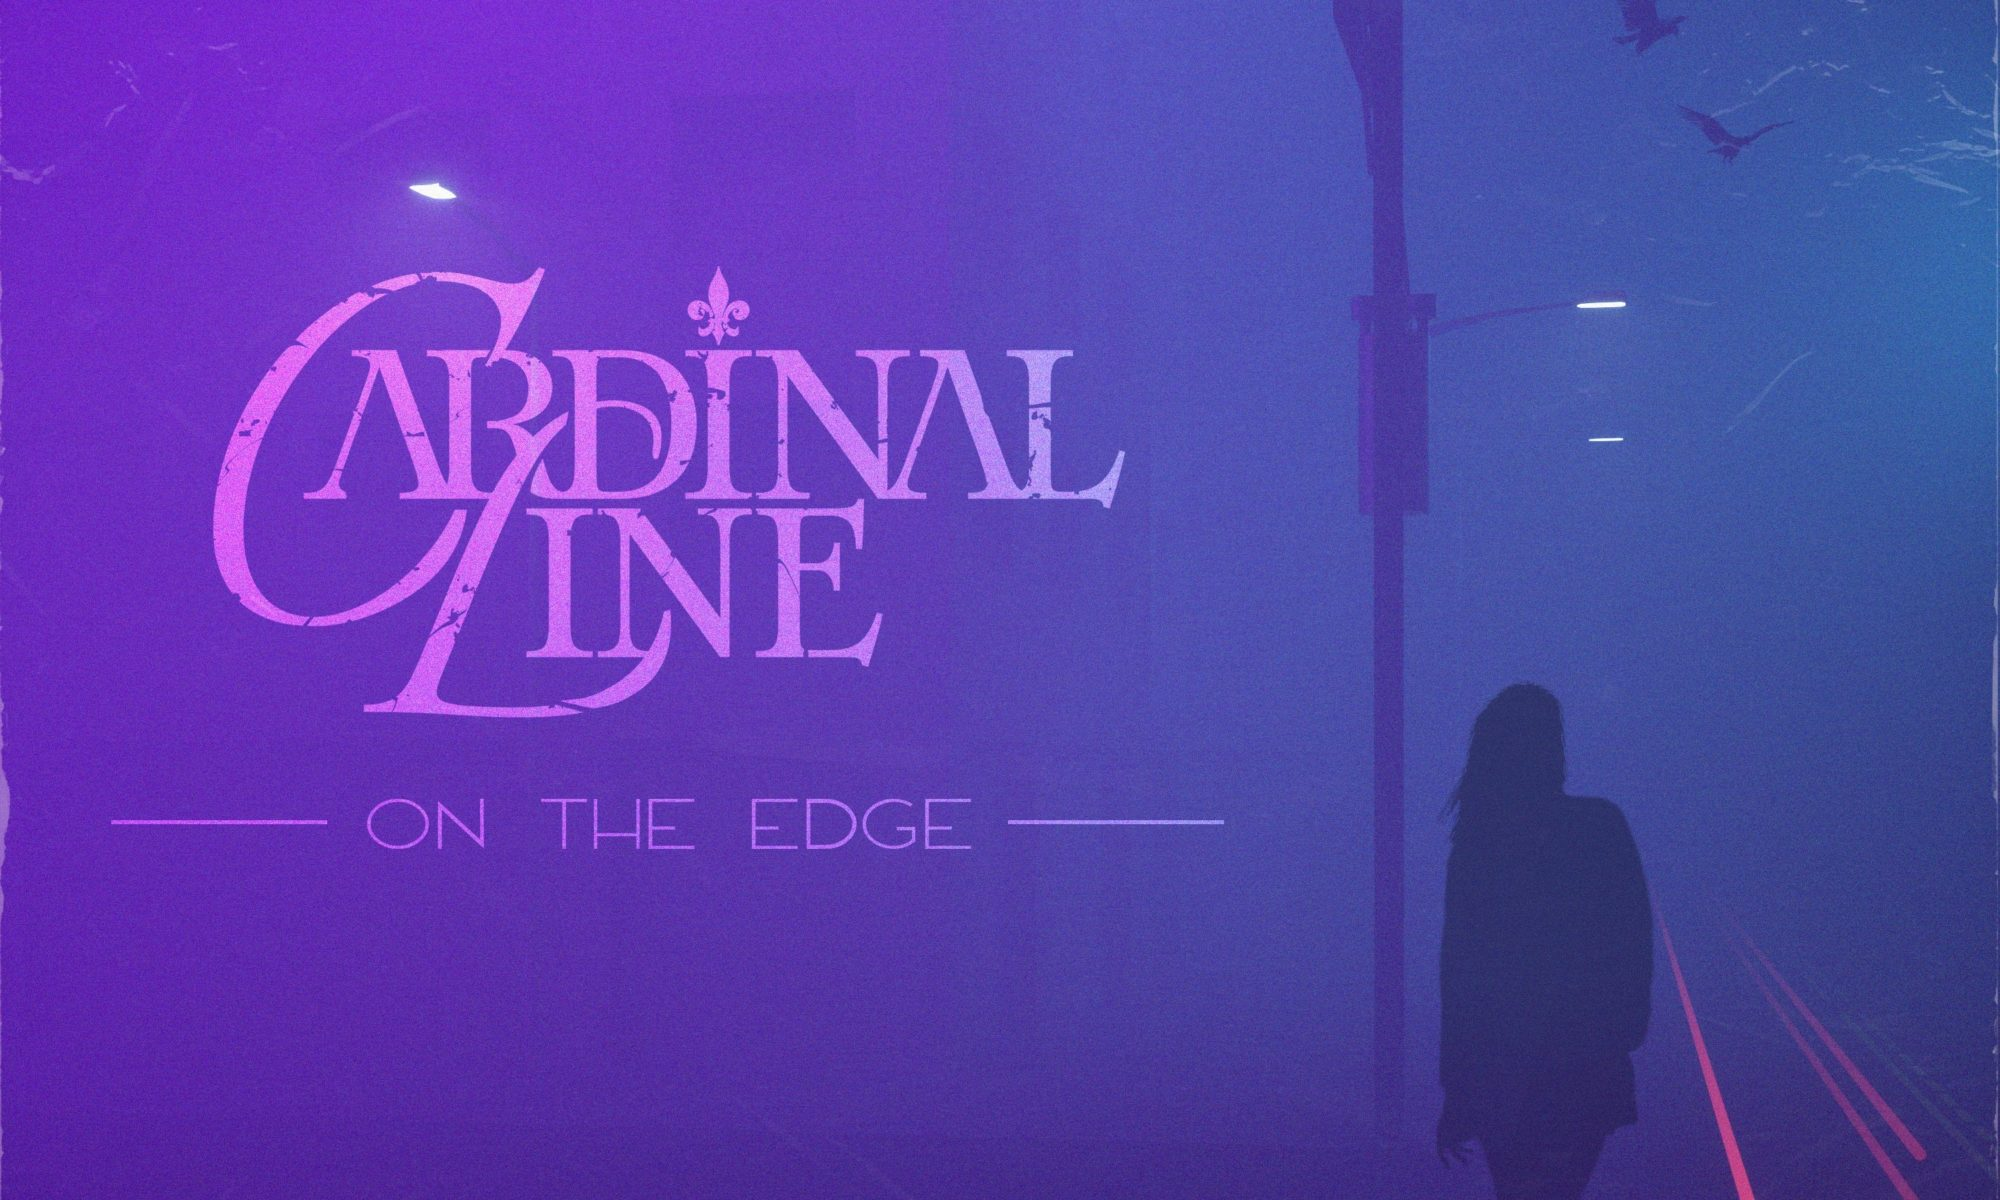 Cardinal Line - Official Website